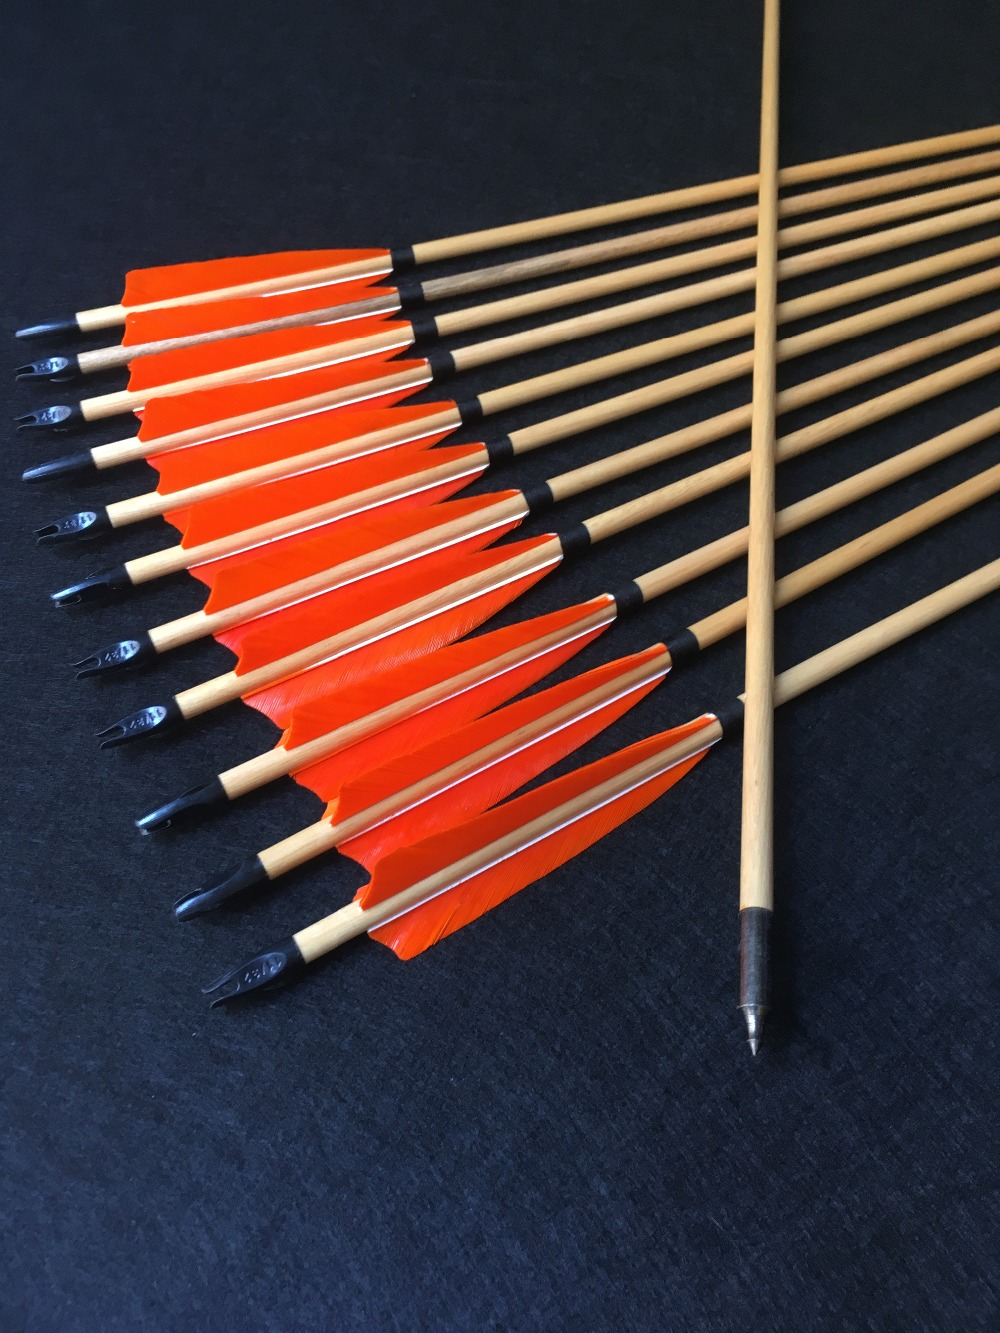 6/12 pcs tranditional wooden arrow turkey feather wood arrows archery bow hunting shooting6/12 pcs tranditional wooden arrow turkey feather wood arrows archery bow hunting shooting